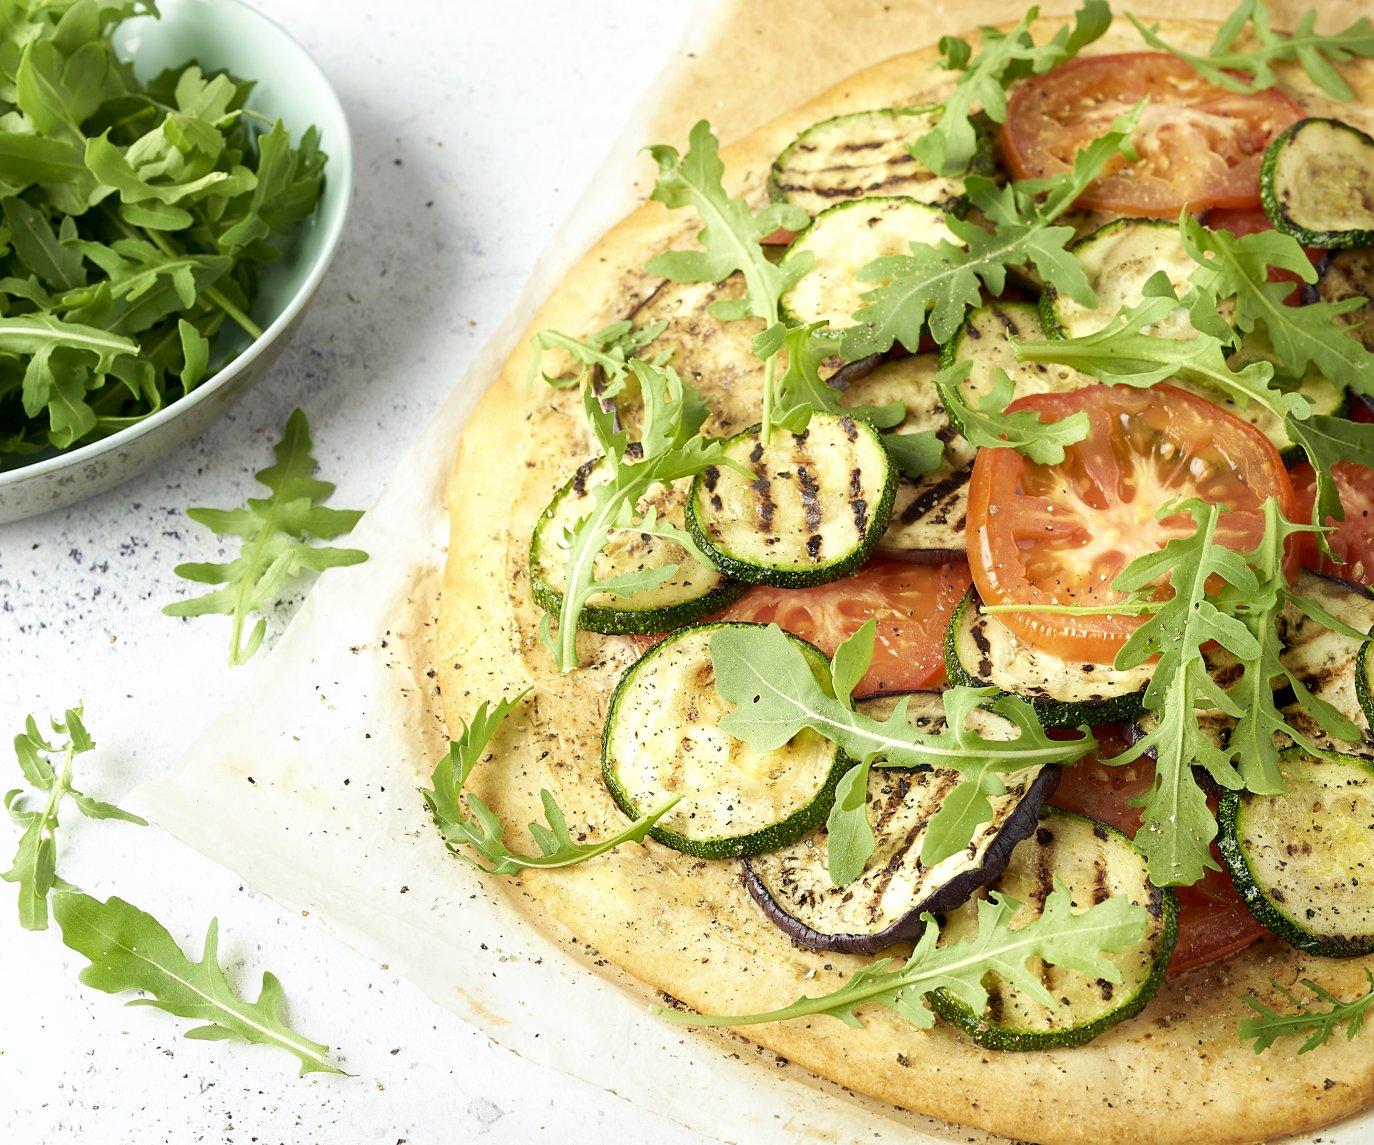 Pizza met kruidige ricotta en gegrilde groenten